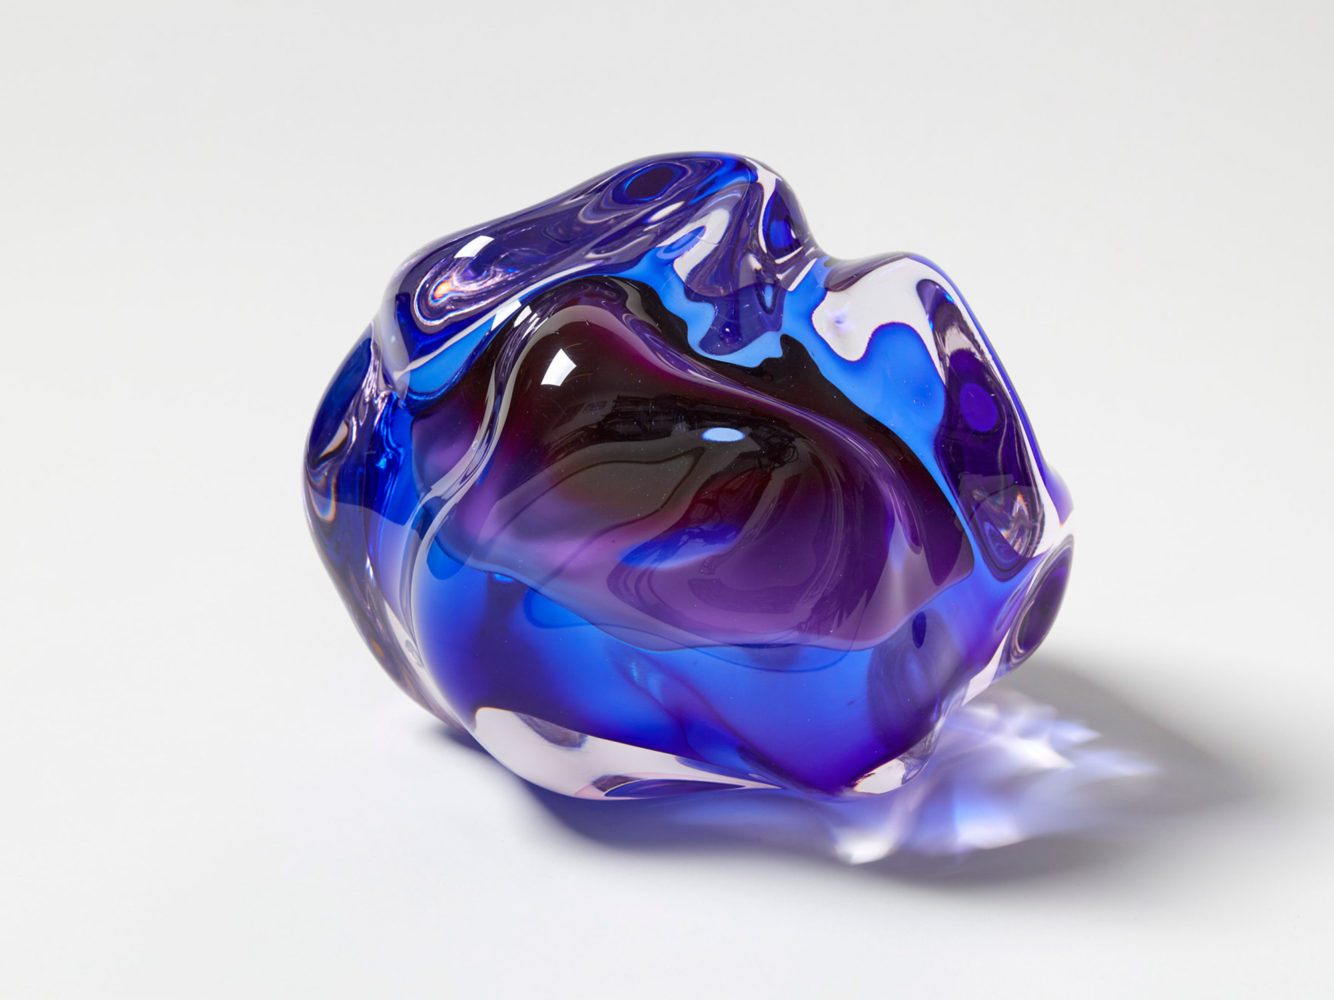 Fluid Rocks: Artist Flavie Audi Forms Gem-Like Sculptures from Glass (7 pics)